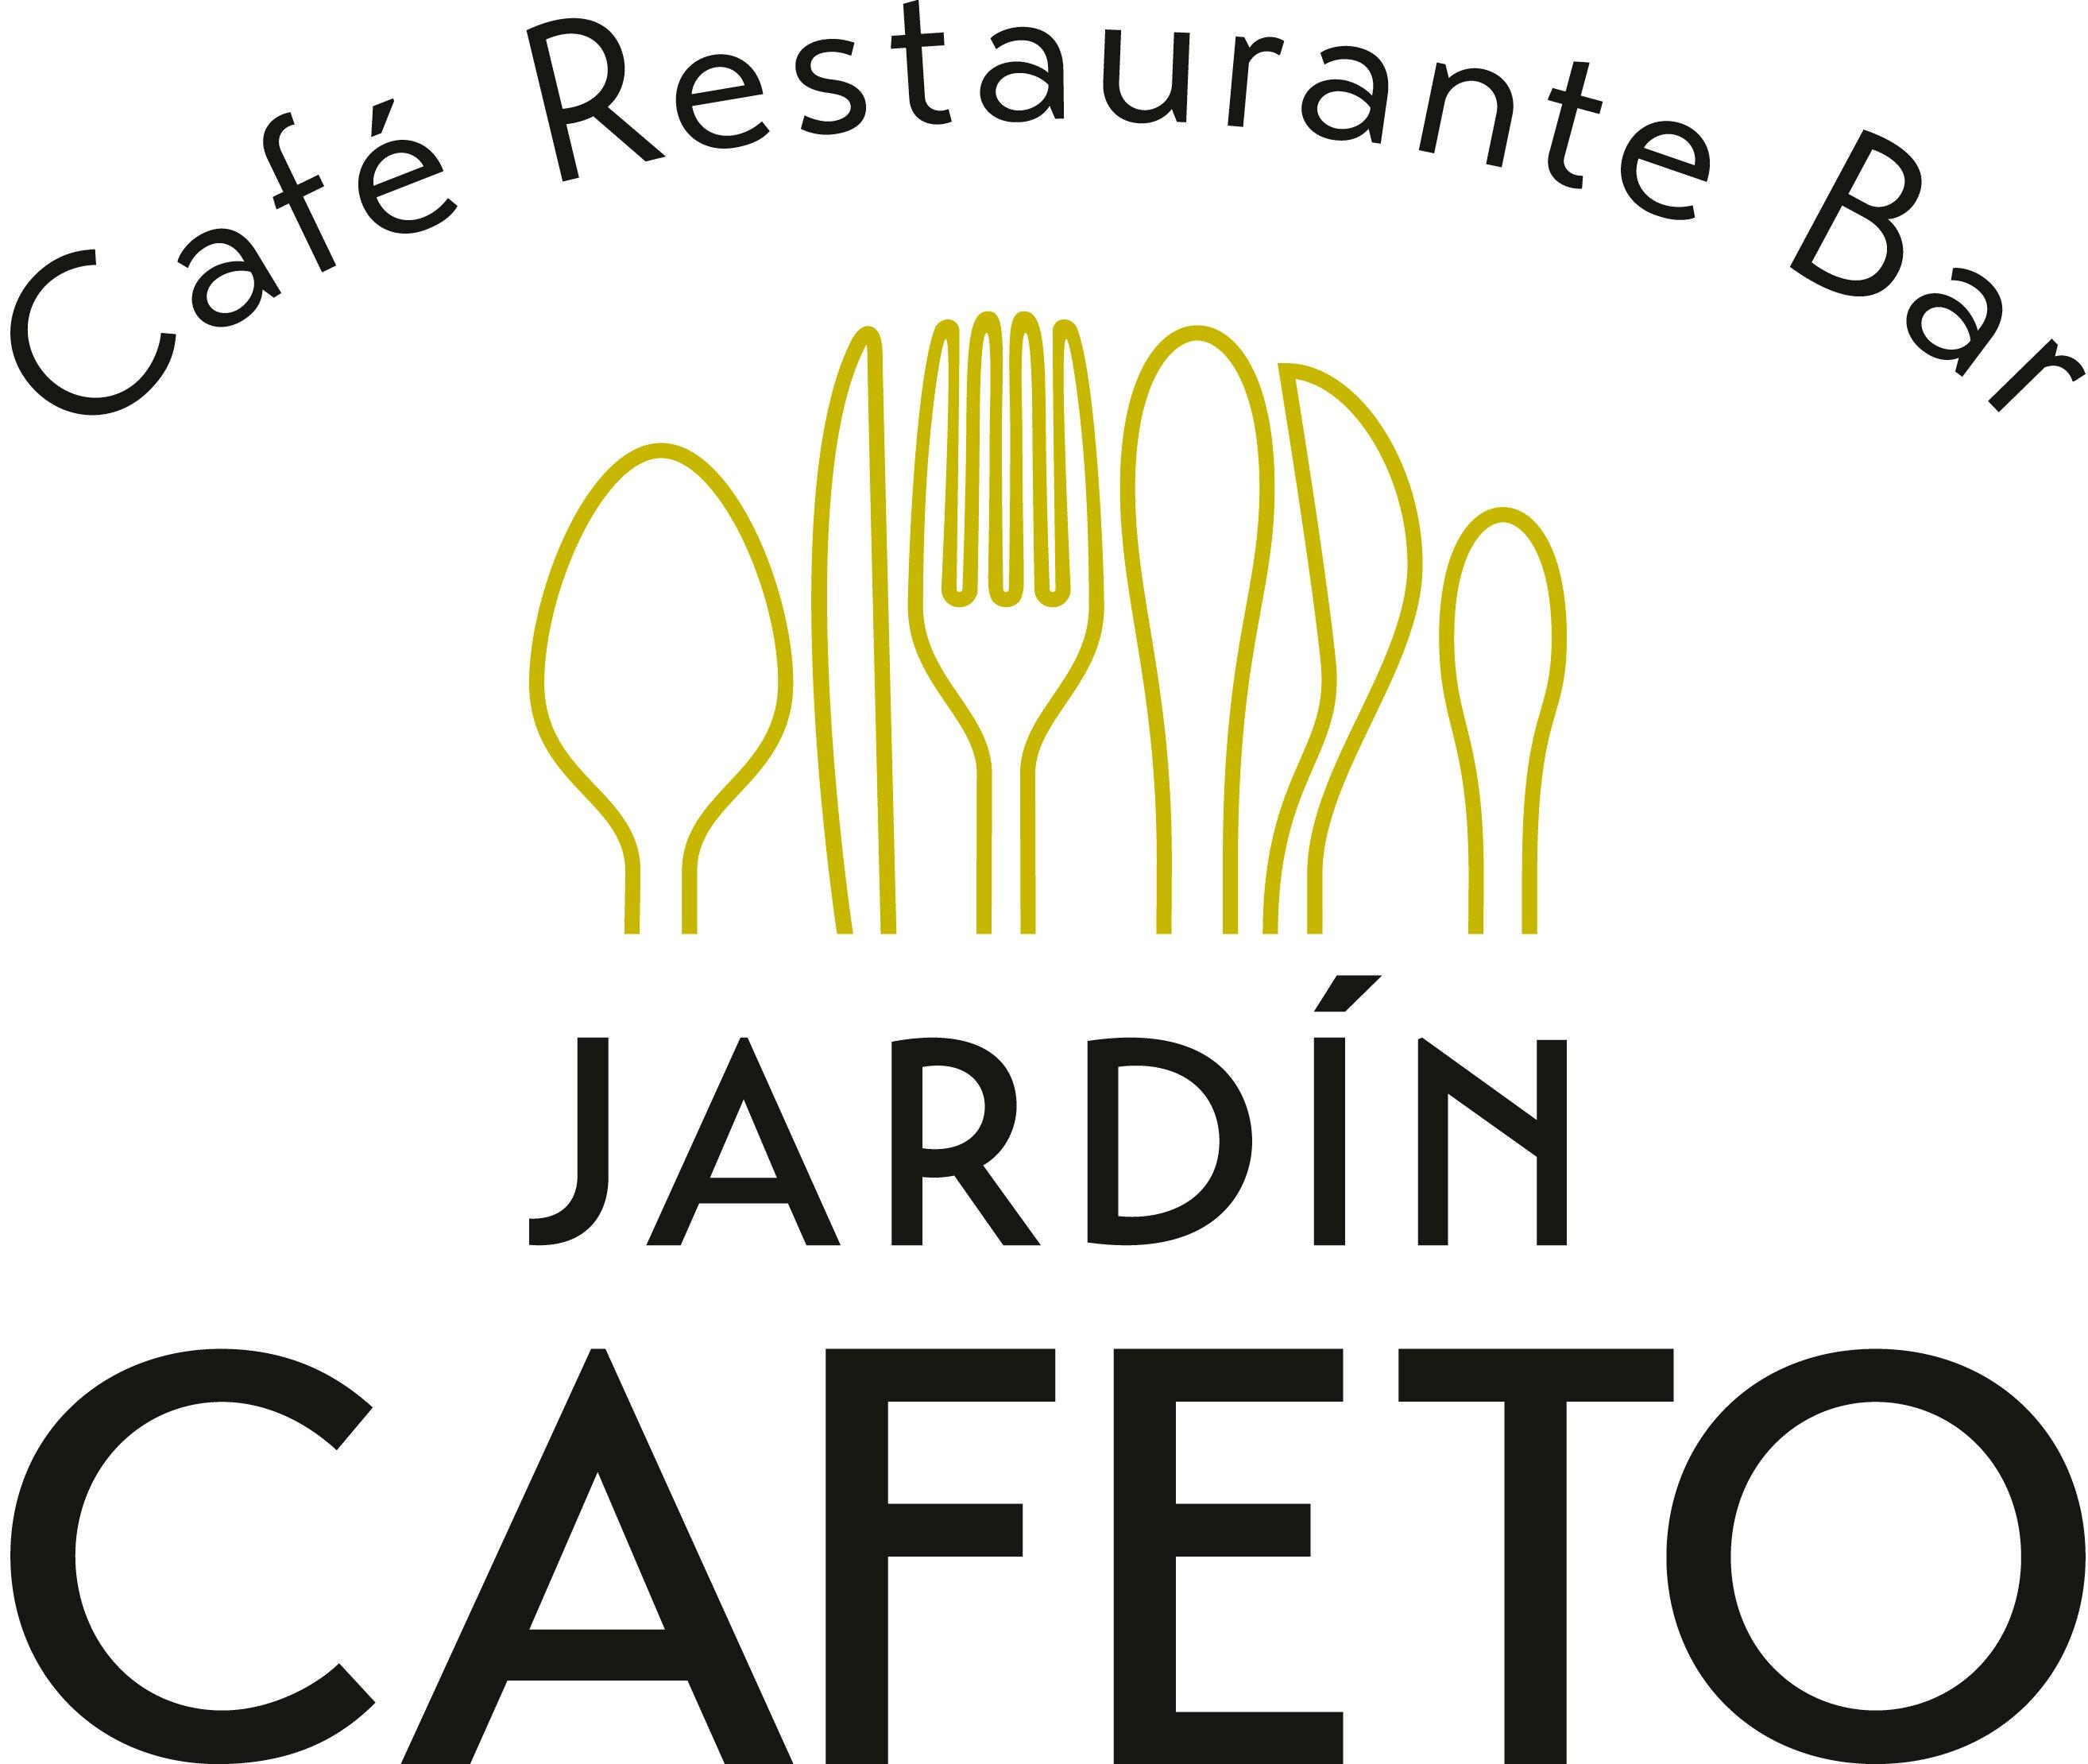 Jardin cafeto jardincafeto twitter for Jardin logo